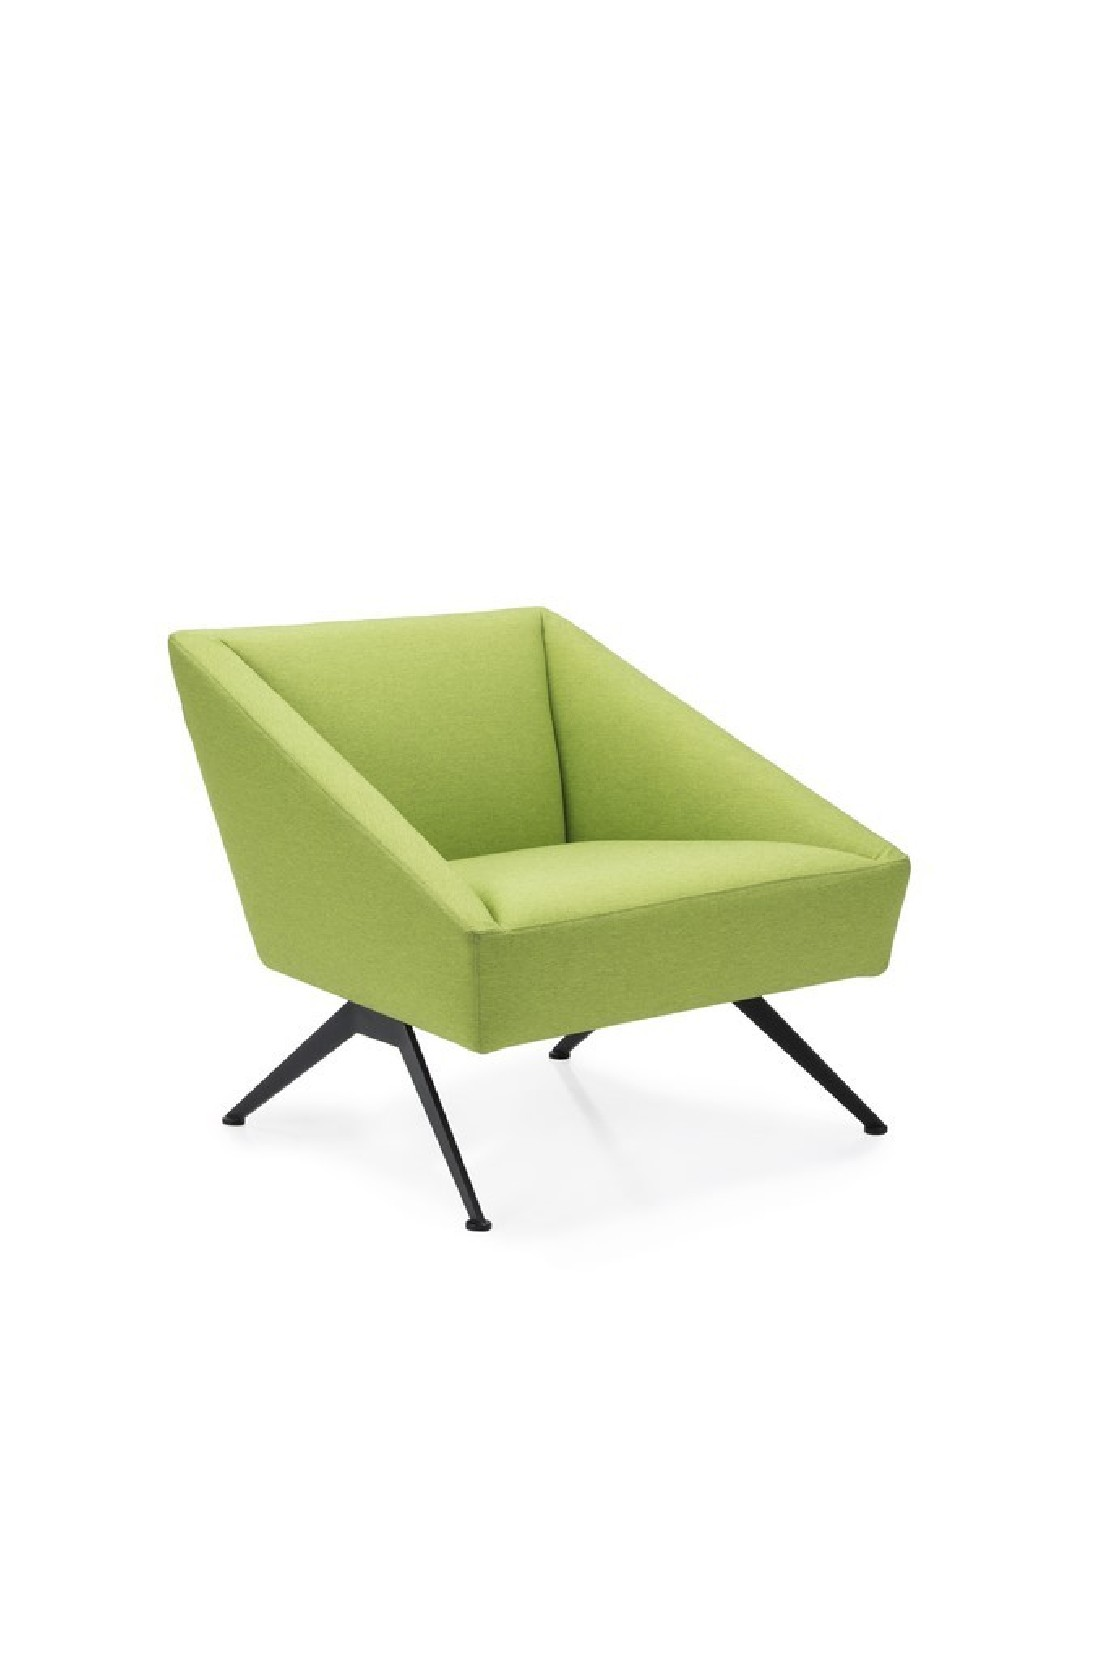 canap fauteuil d 39 accueil en tissu design amarcord luxy. Black Bedroom Furniture Sets. Home Design Ideas